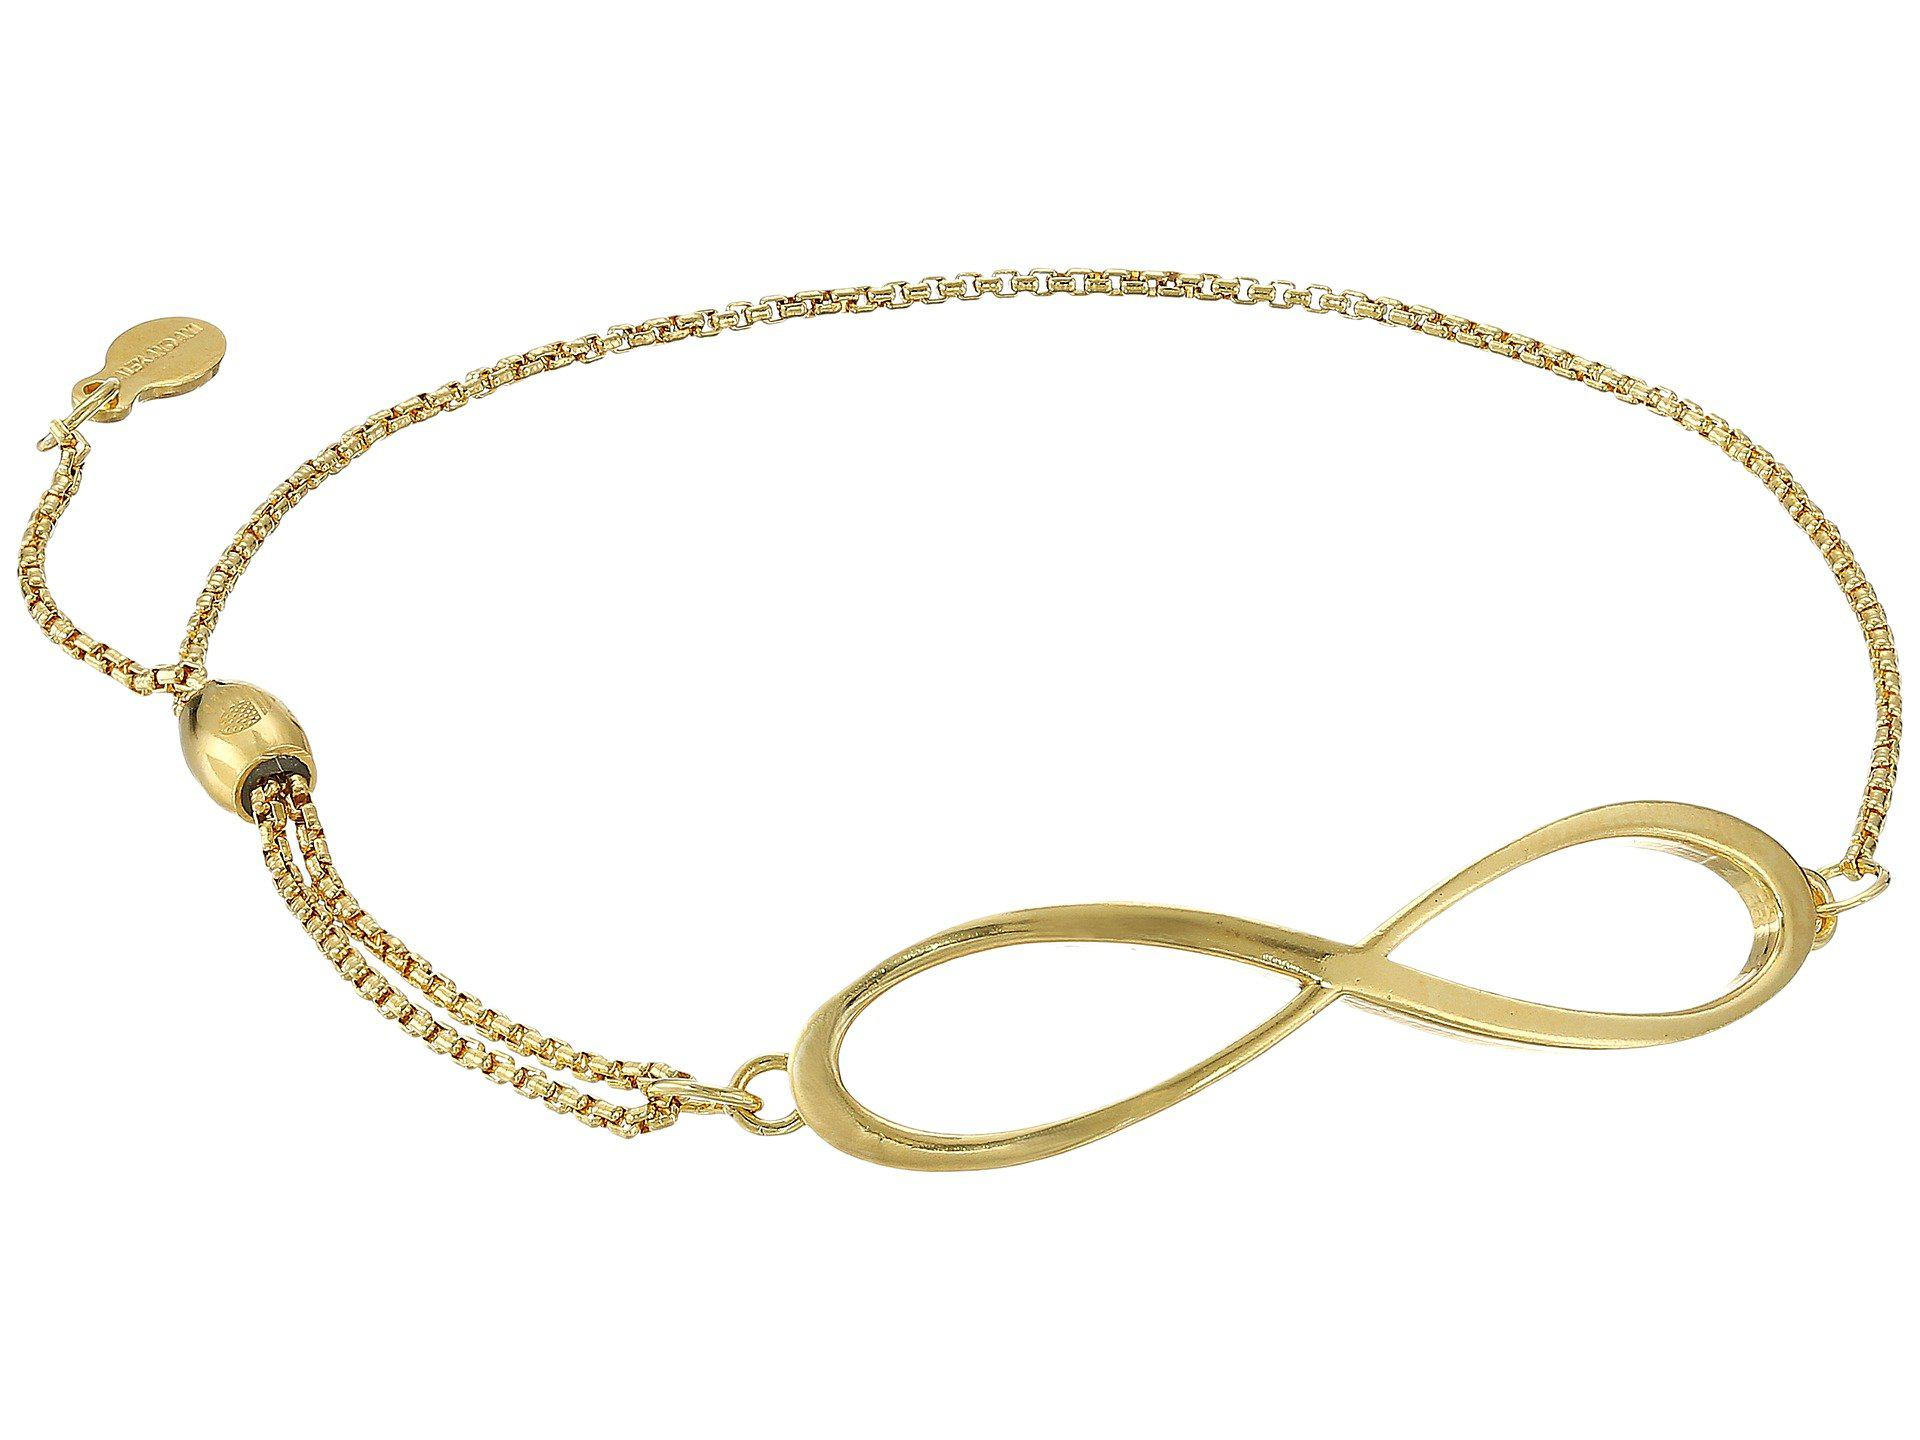 ani and infinity dp charm amazon i toys alex bracelet games bangle com initial